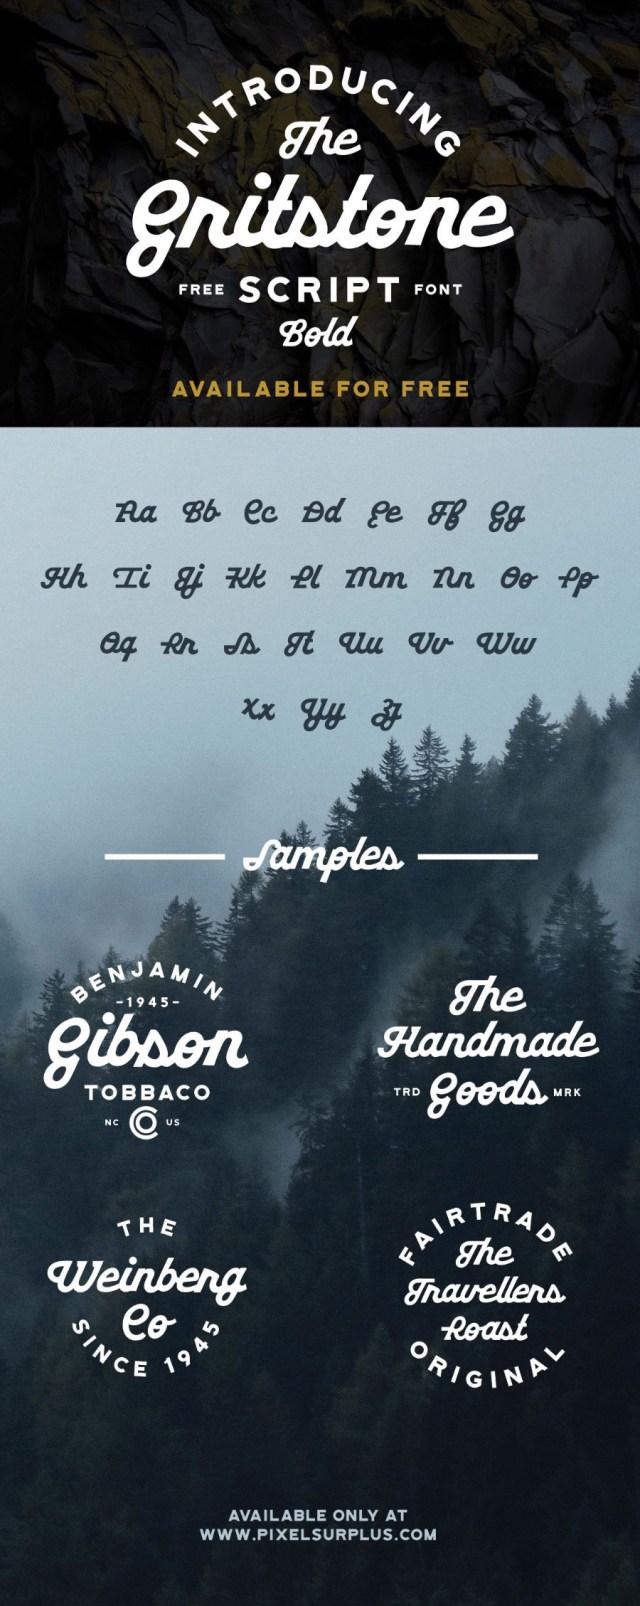 Gritstone Script Free Typeface